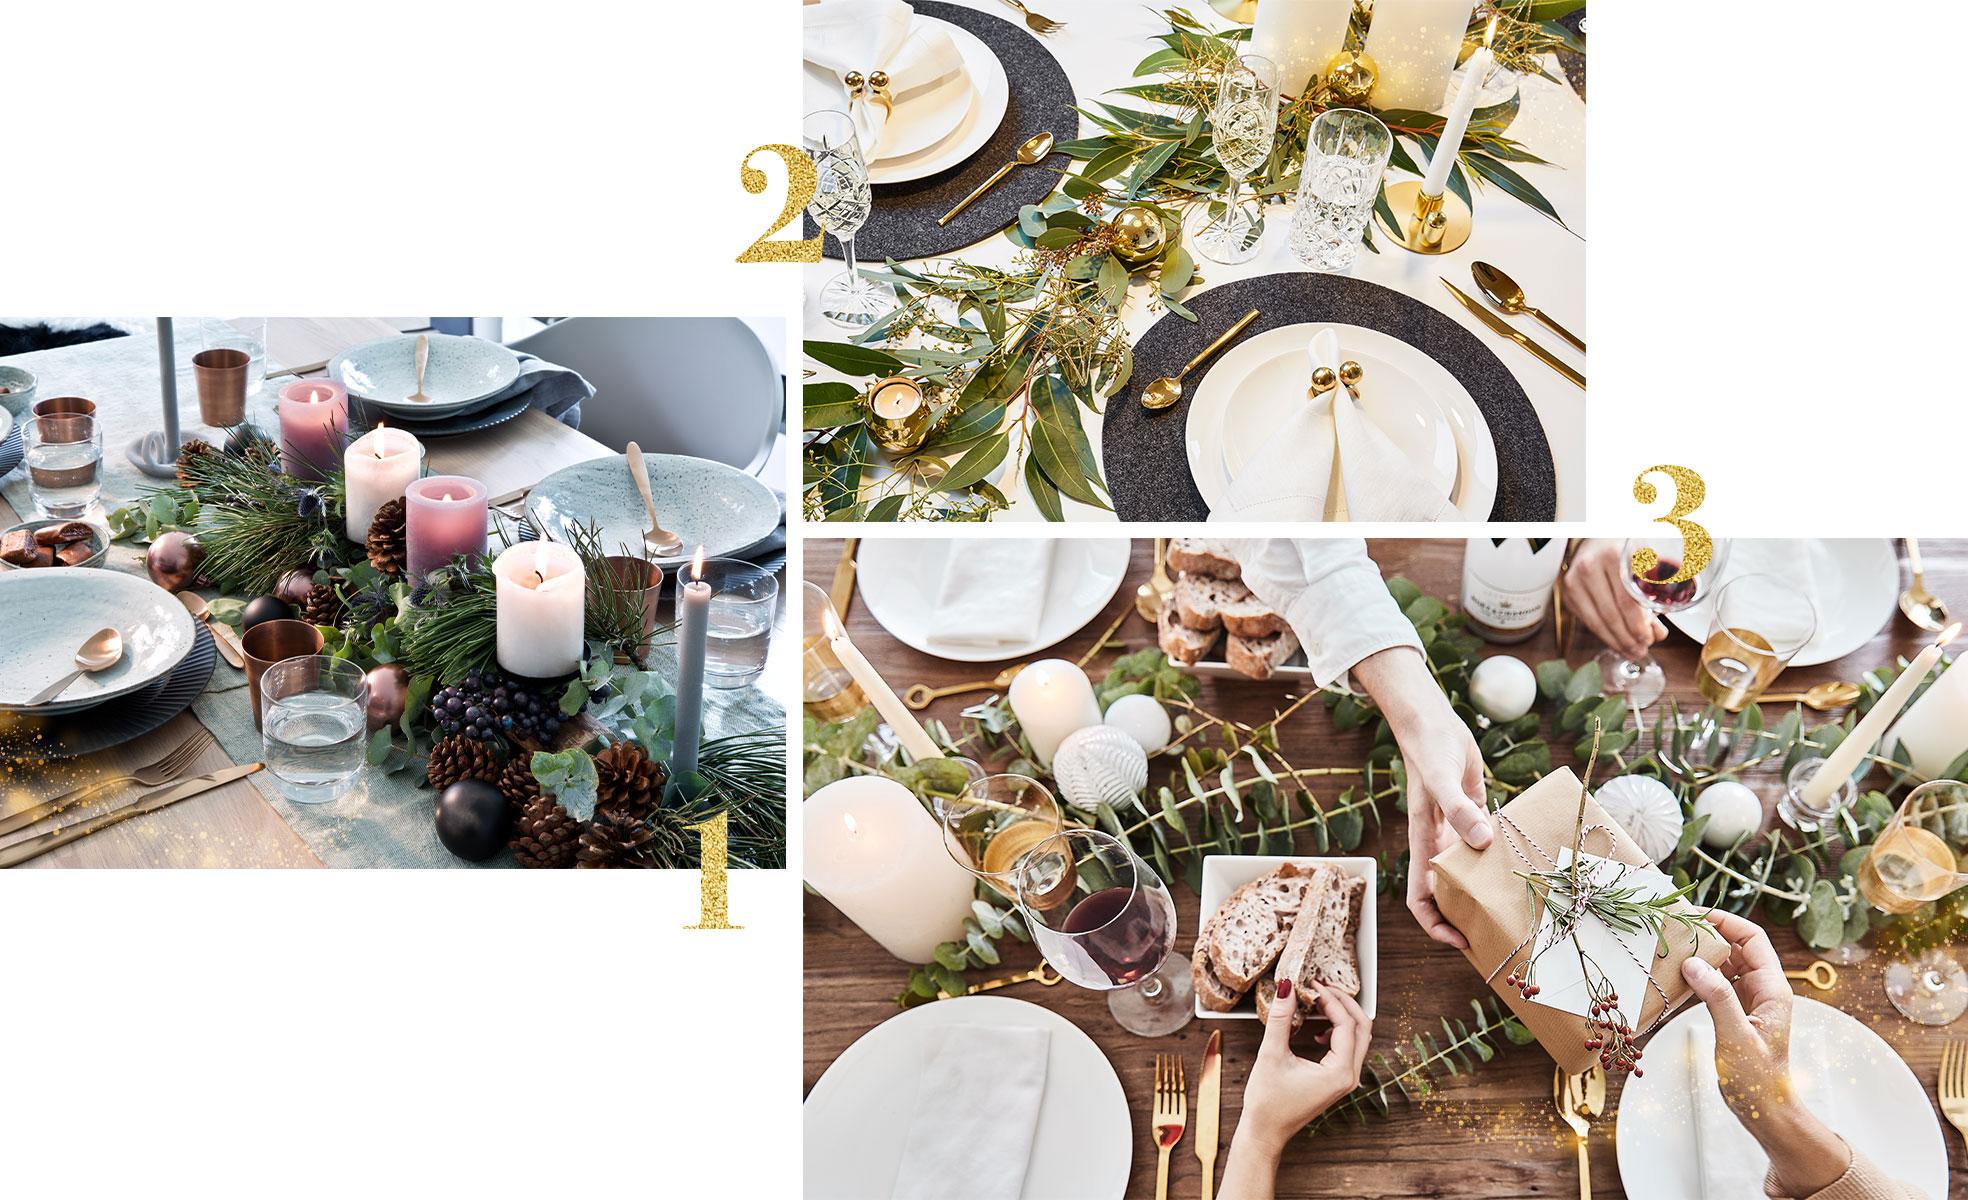 Dicas para arranjo de mesa de Natal | westwing.com.br